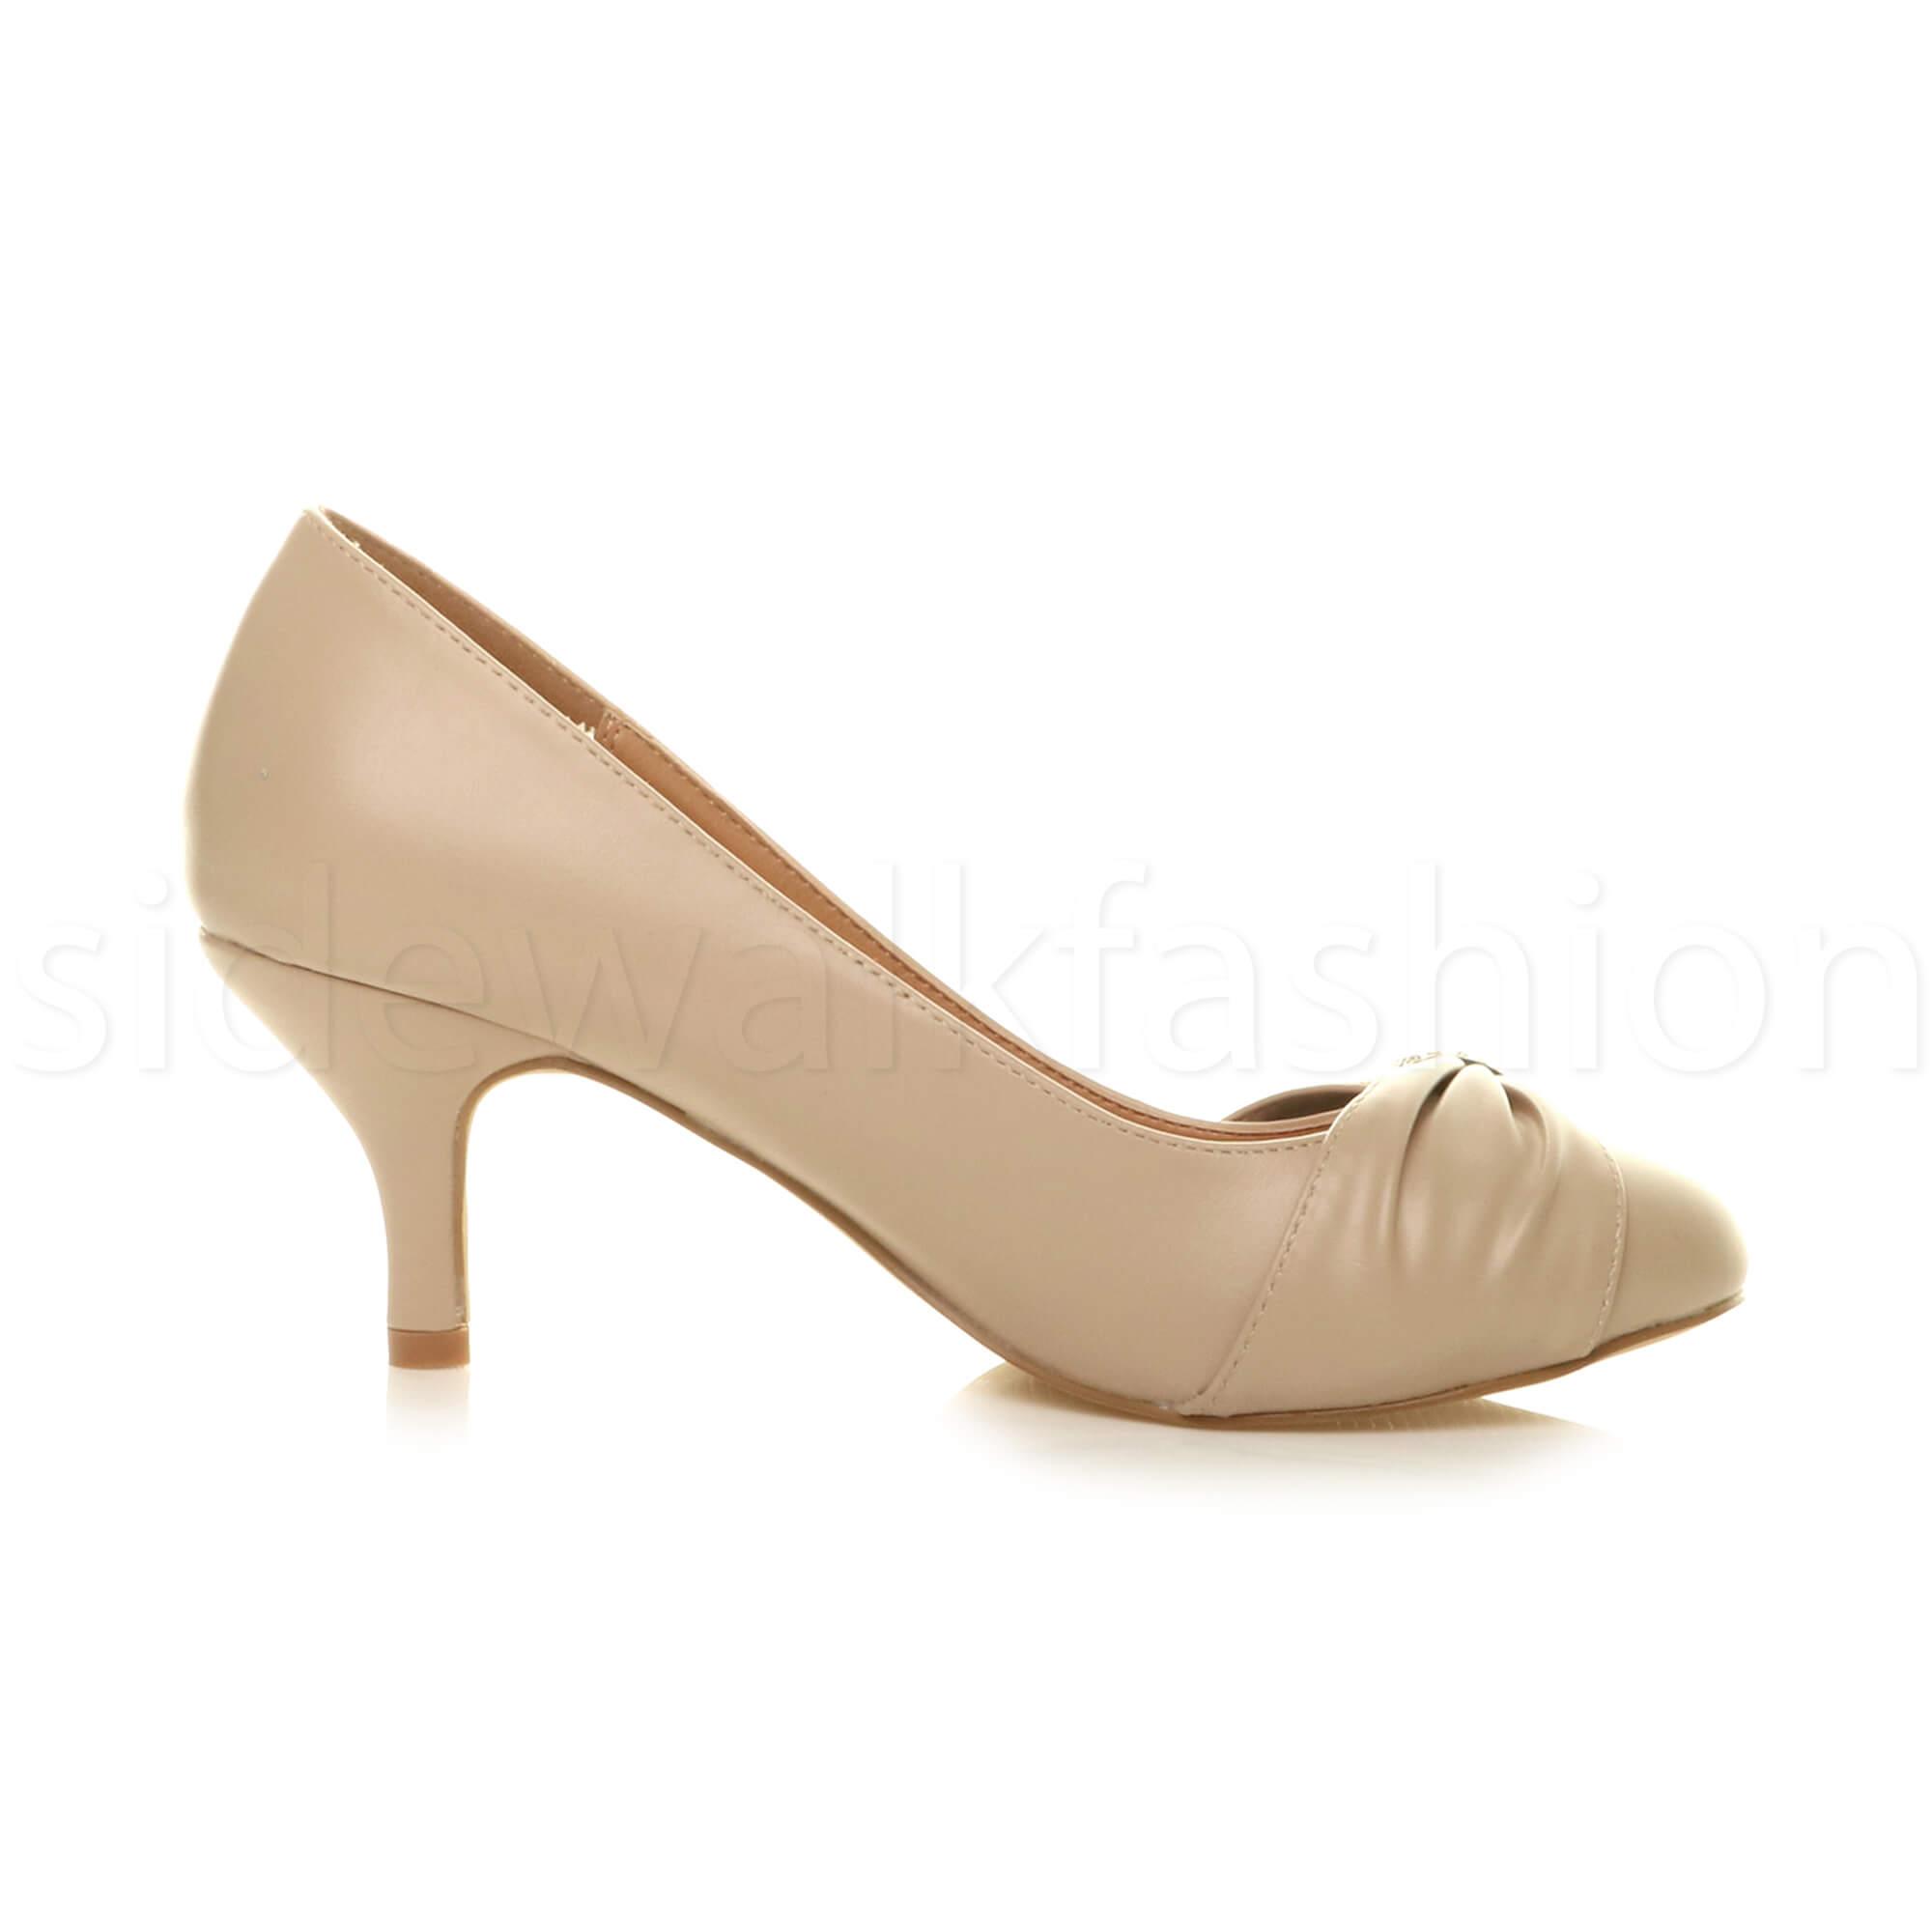 Womens-ladies-low-mid-heel-diamante-party-smart-evening-court-shoes-size thumbnail 60